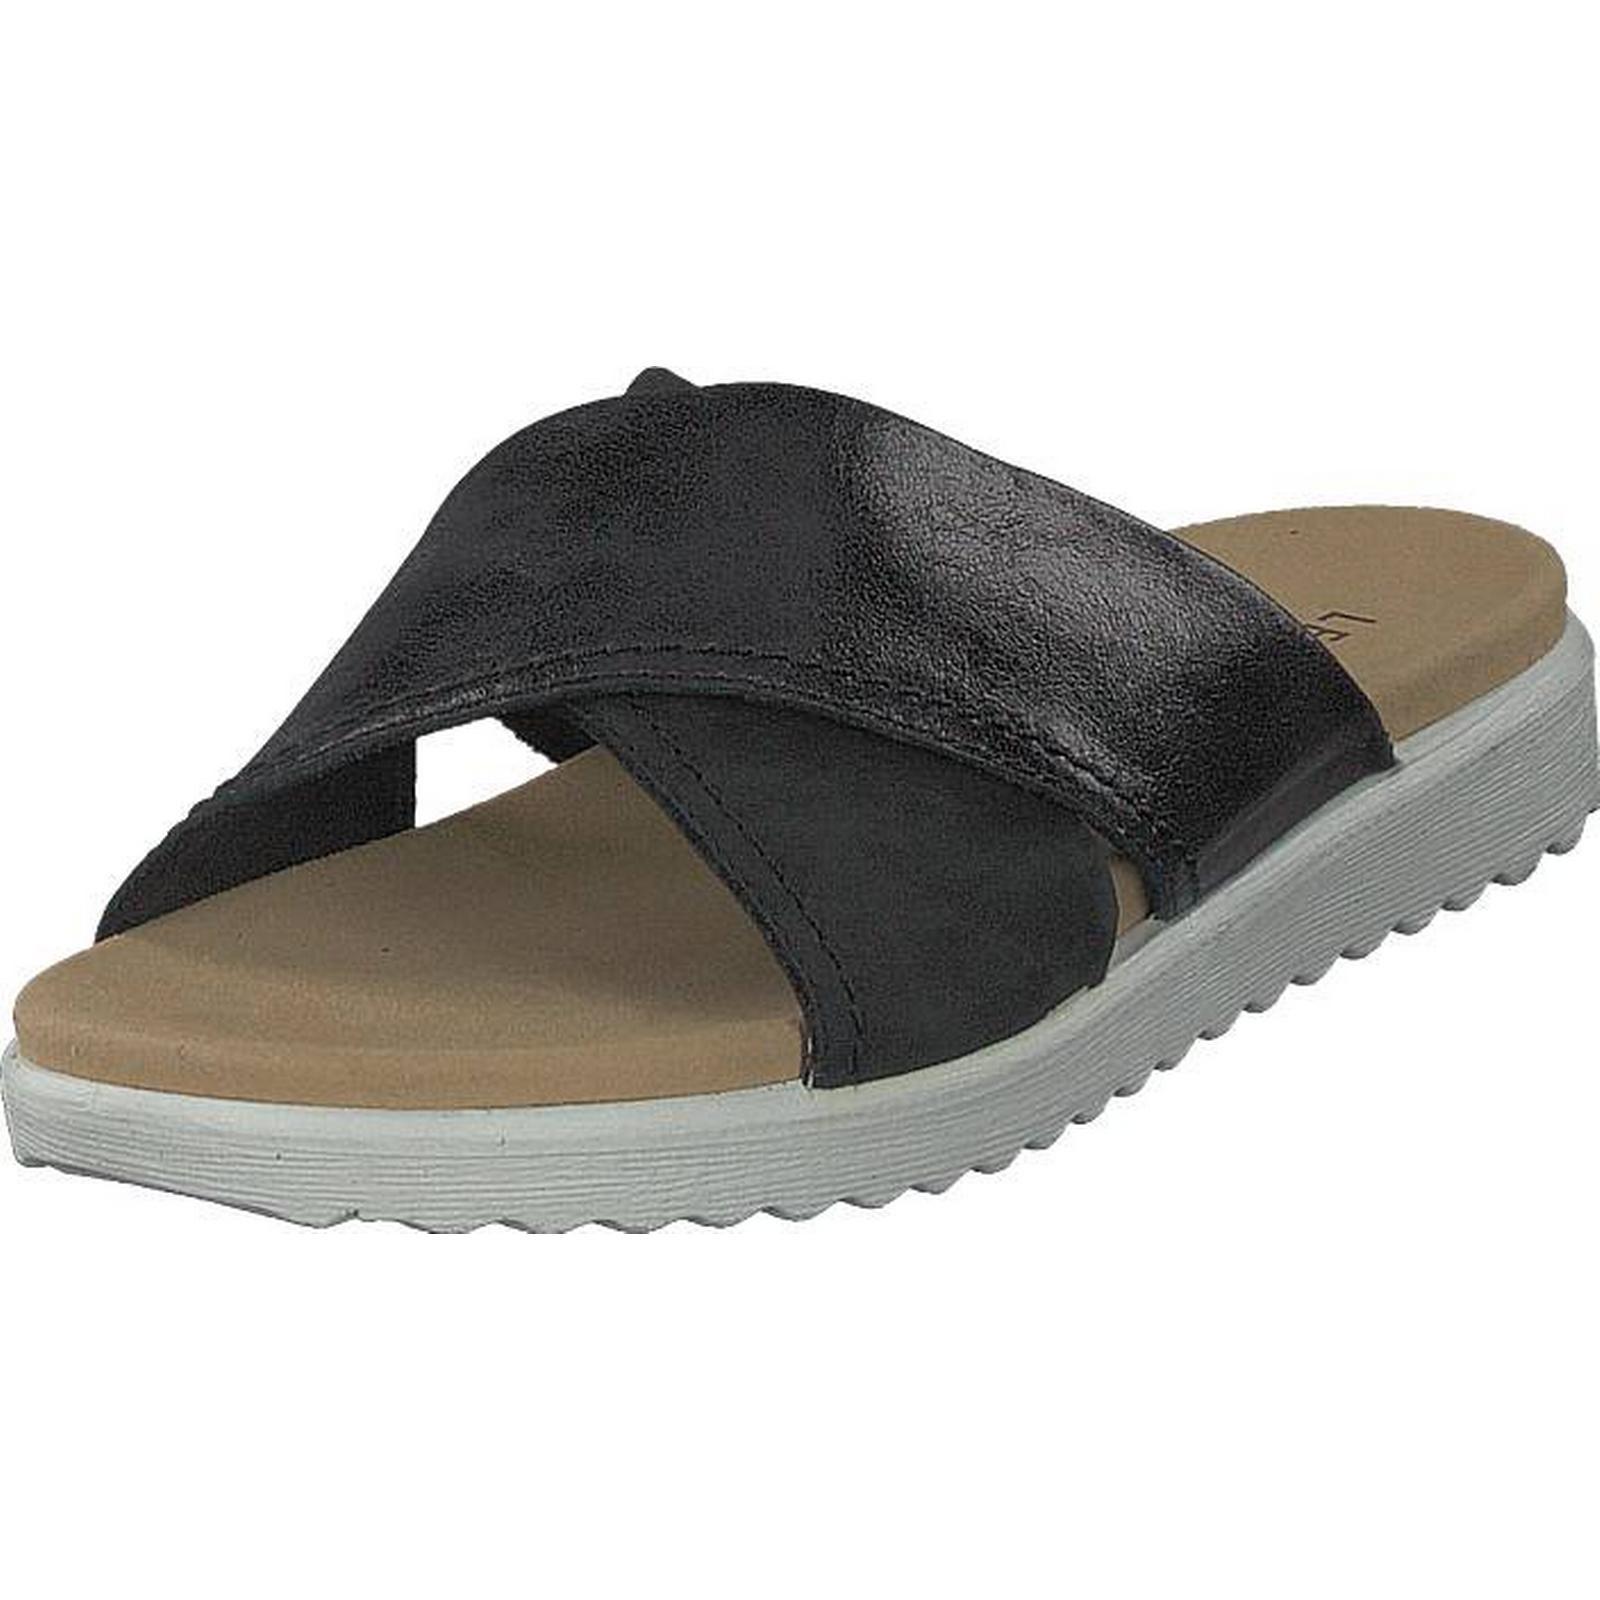 Legero Savona Black, Shoes, Sandals & Slippers, Sandals, Brown, Grey, Female, Female, Grey, 36 33e518